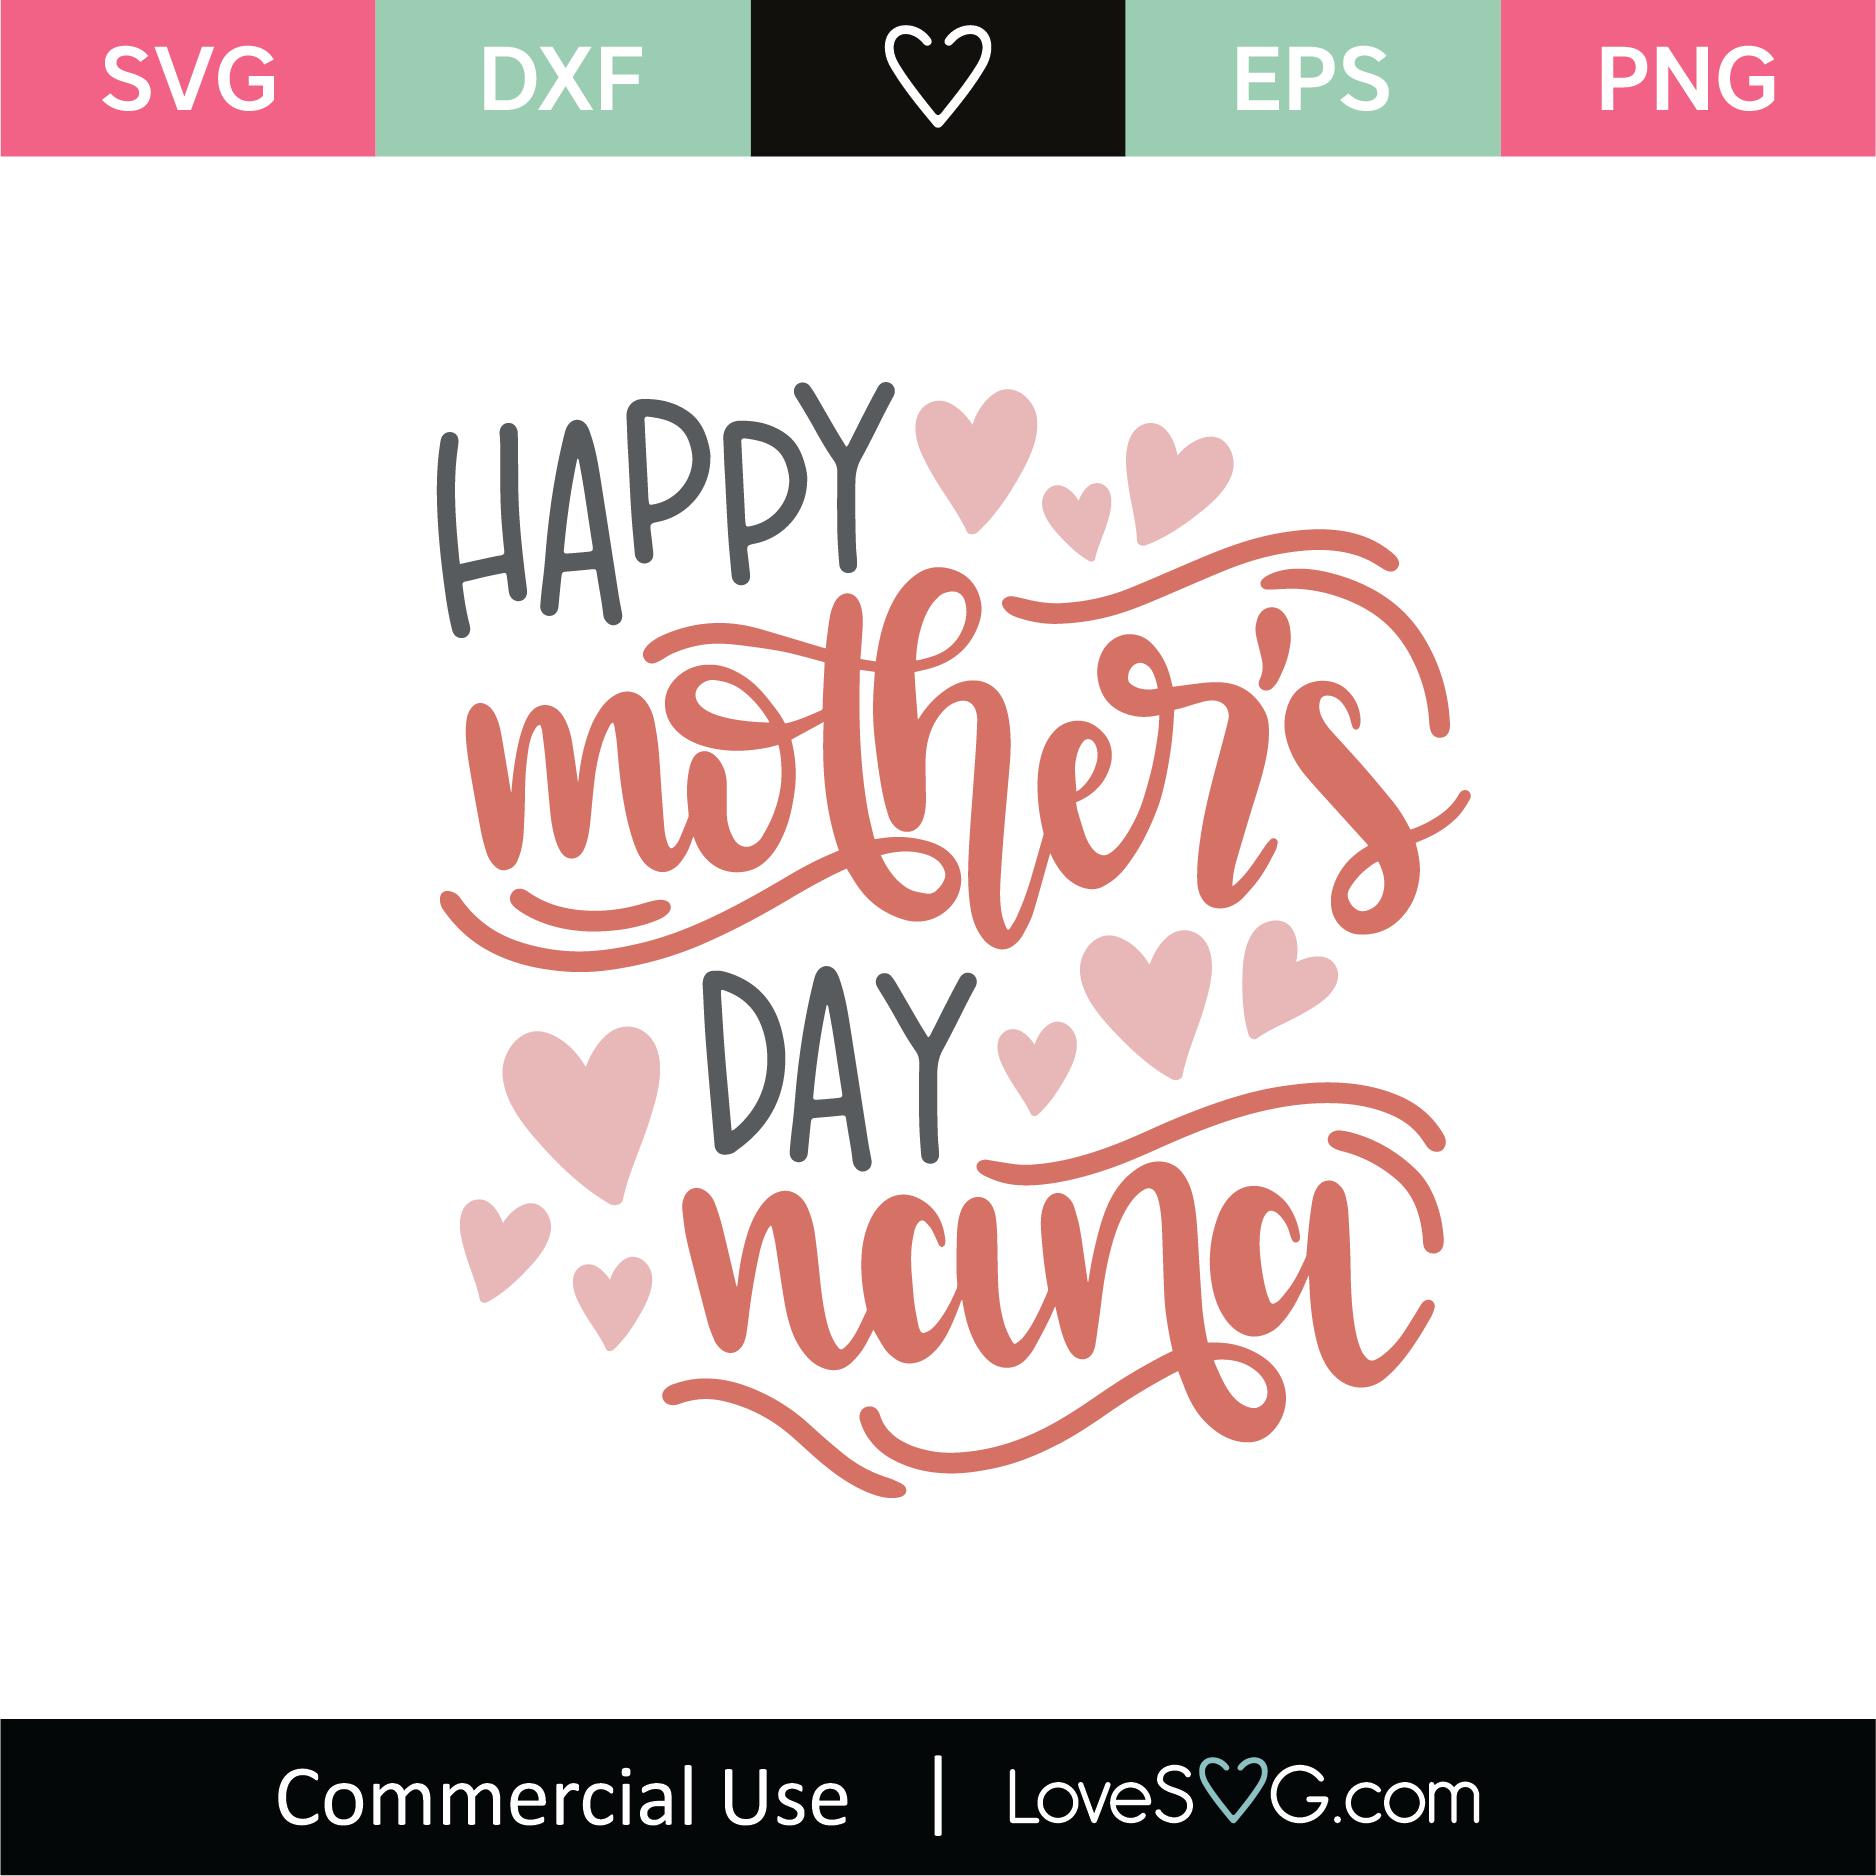 svg Silhouette Cut File Cricut Cut File dxf SVG File Cut Designs Quote png Best Nana Ever SVG Cut File Mother/'s Day SVG